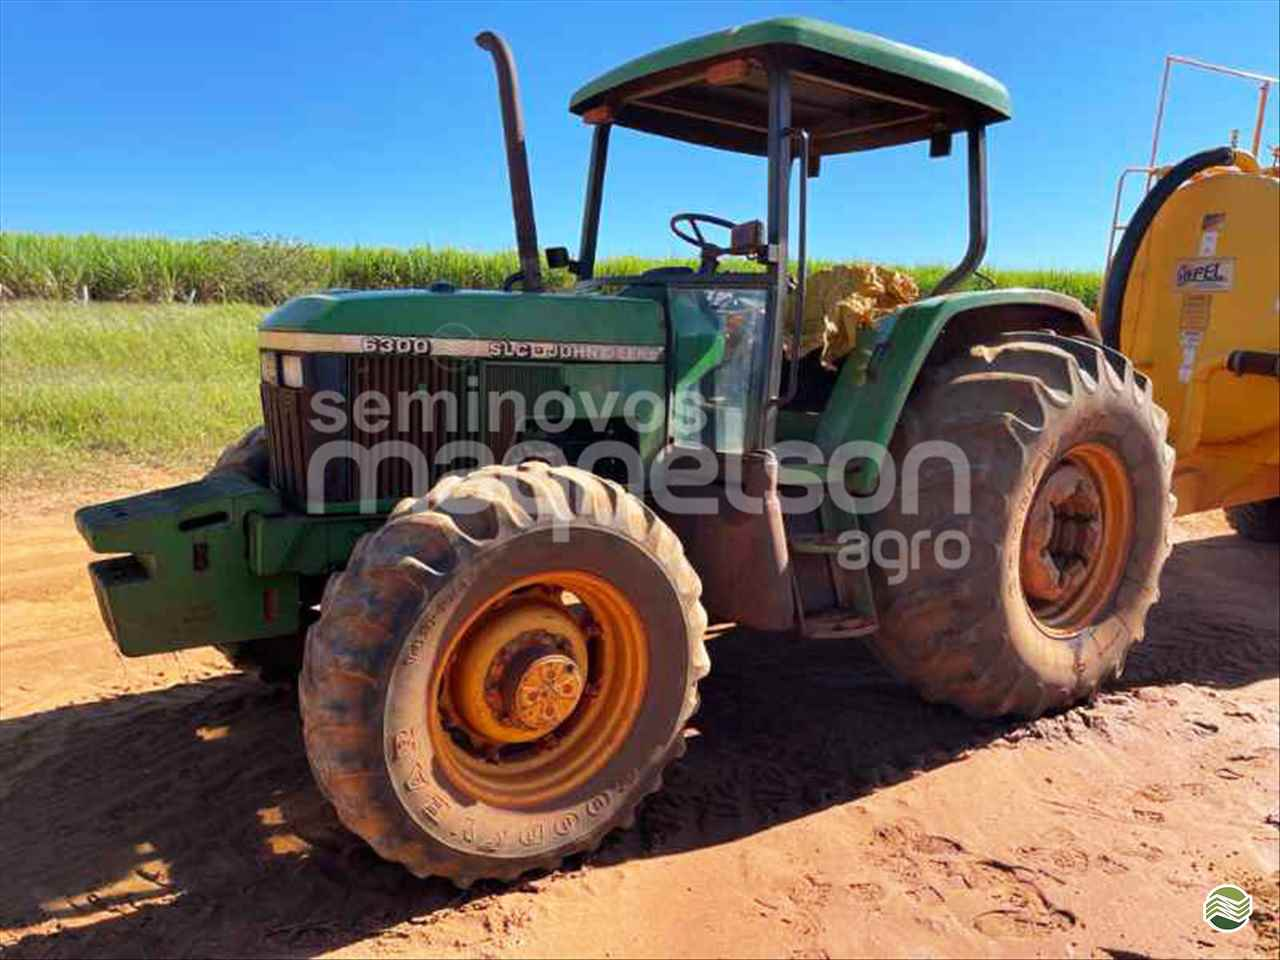 JOHN DEERE 6300 de Maqnelson Seminovos Agro - UBERLANDIA/MG